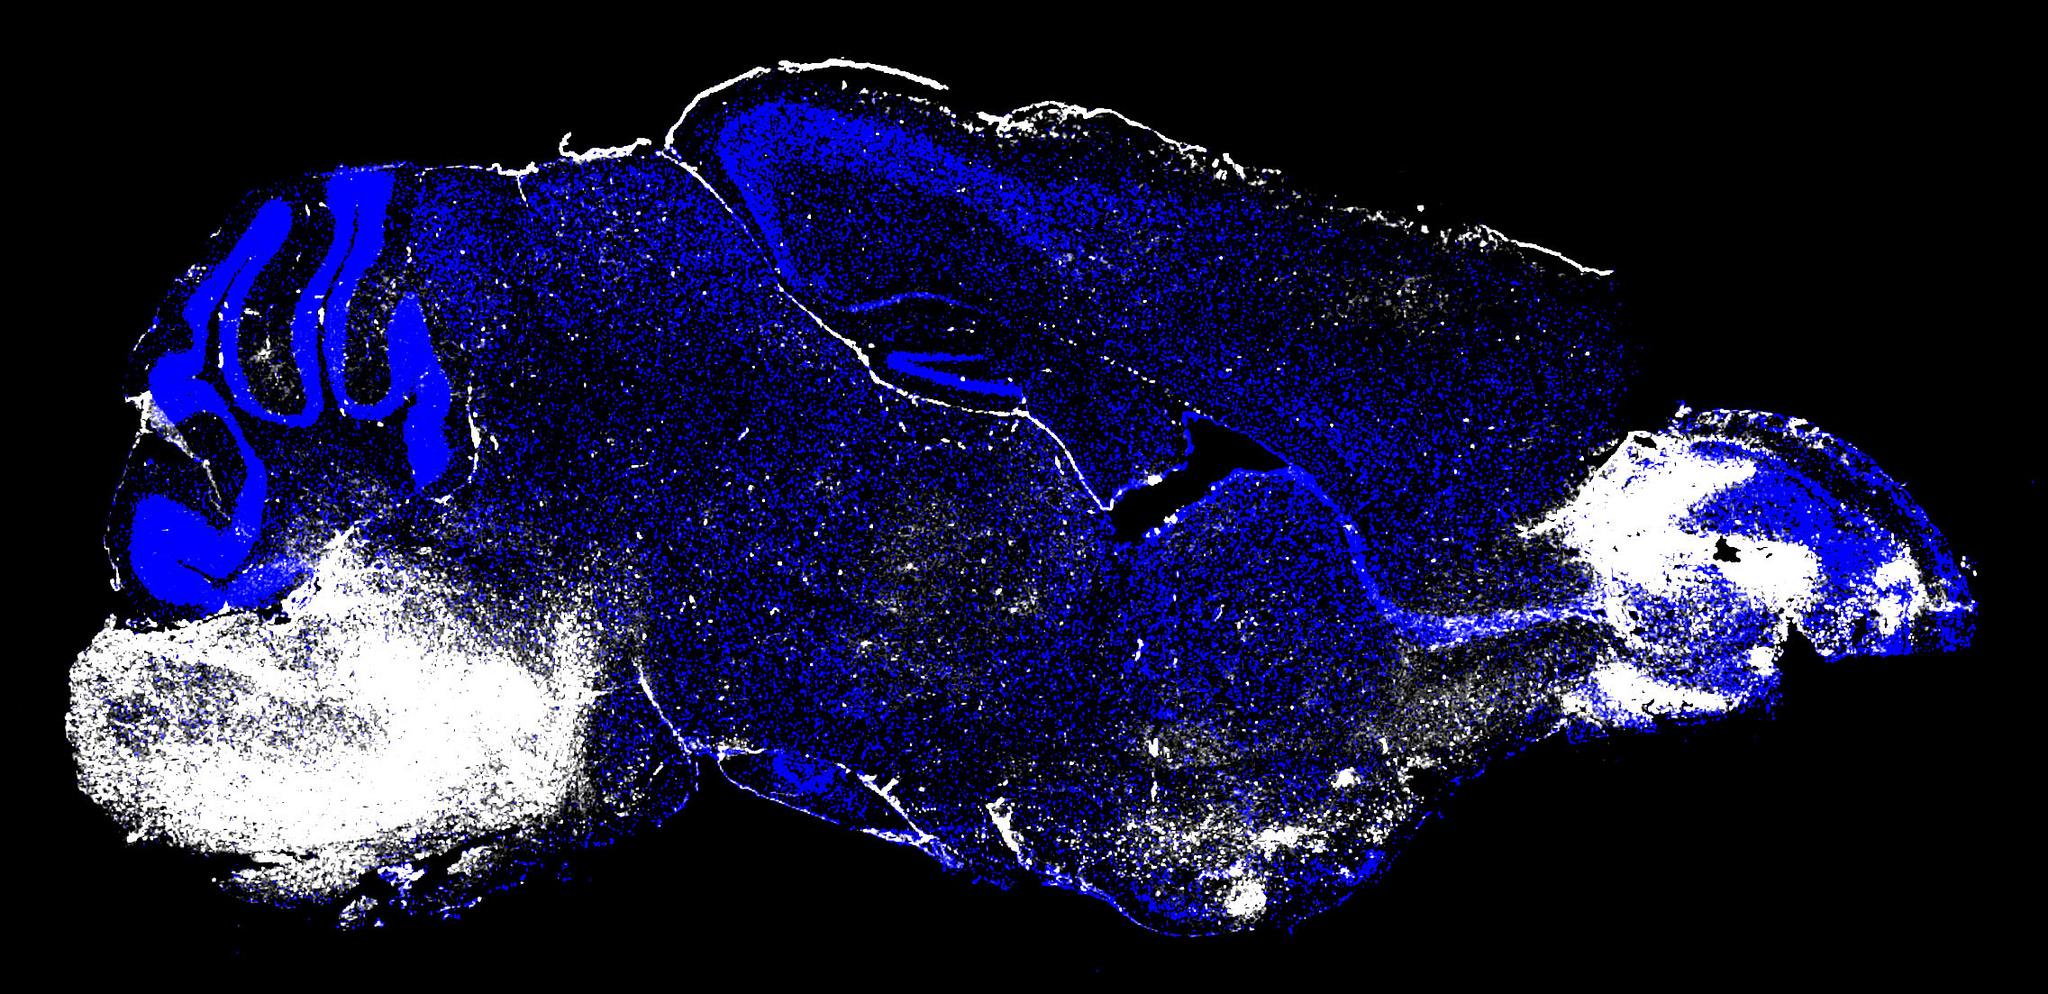 Precancerous pancreatic tissue in mouse